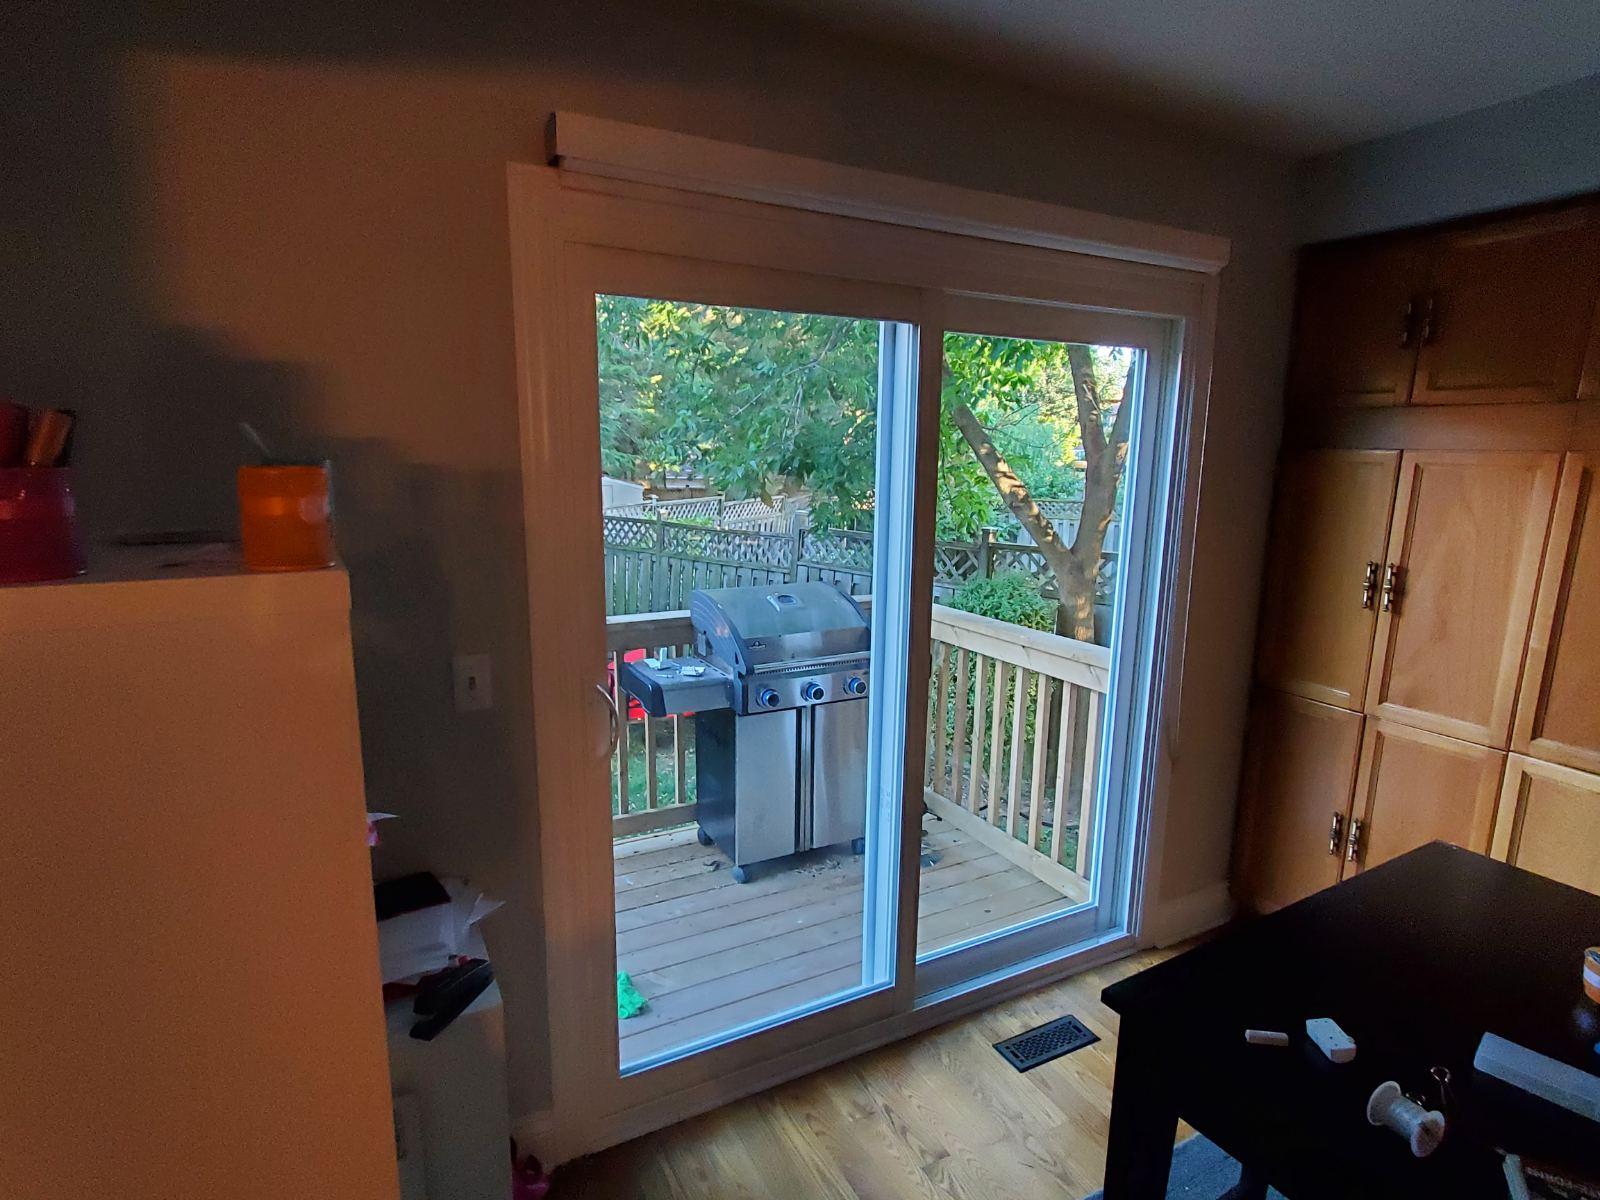 Modern Fiberglass and Steel Door Installation and Replacement, PVC Windows Woodbridge, Maple, Vaughan, King, Aurora, Nemwarket, Caledon, Nobleton, Milton, Kleinburg